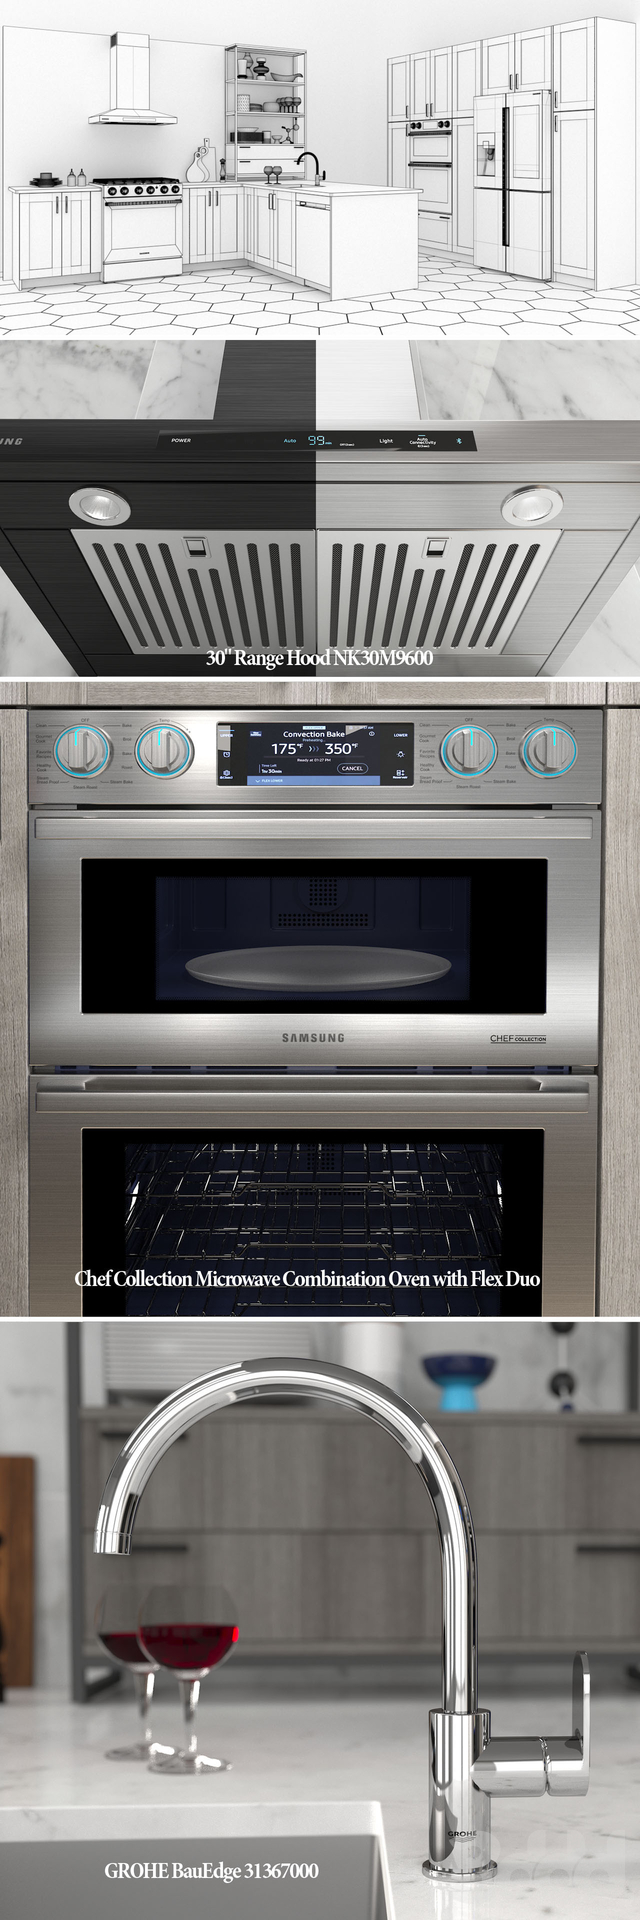 Кухня Samsung Chef Collection